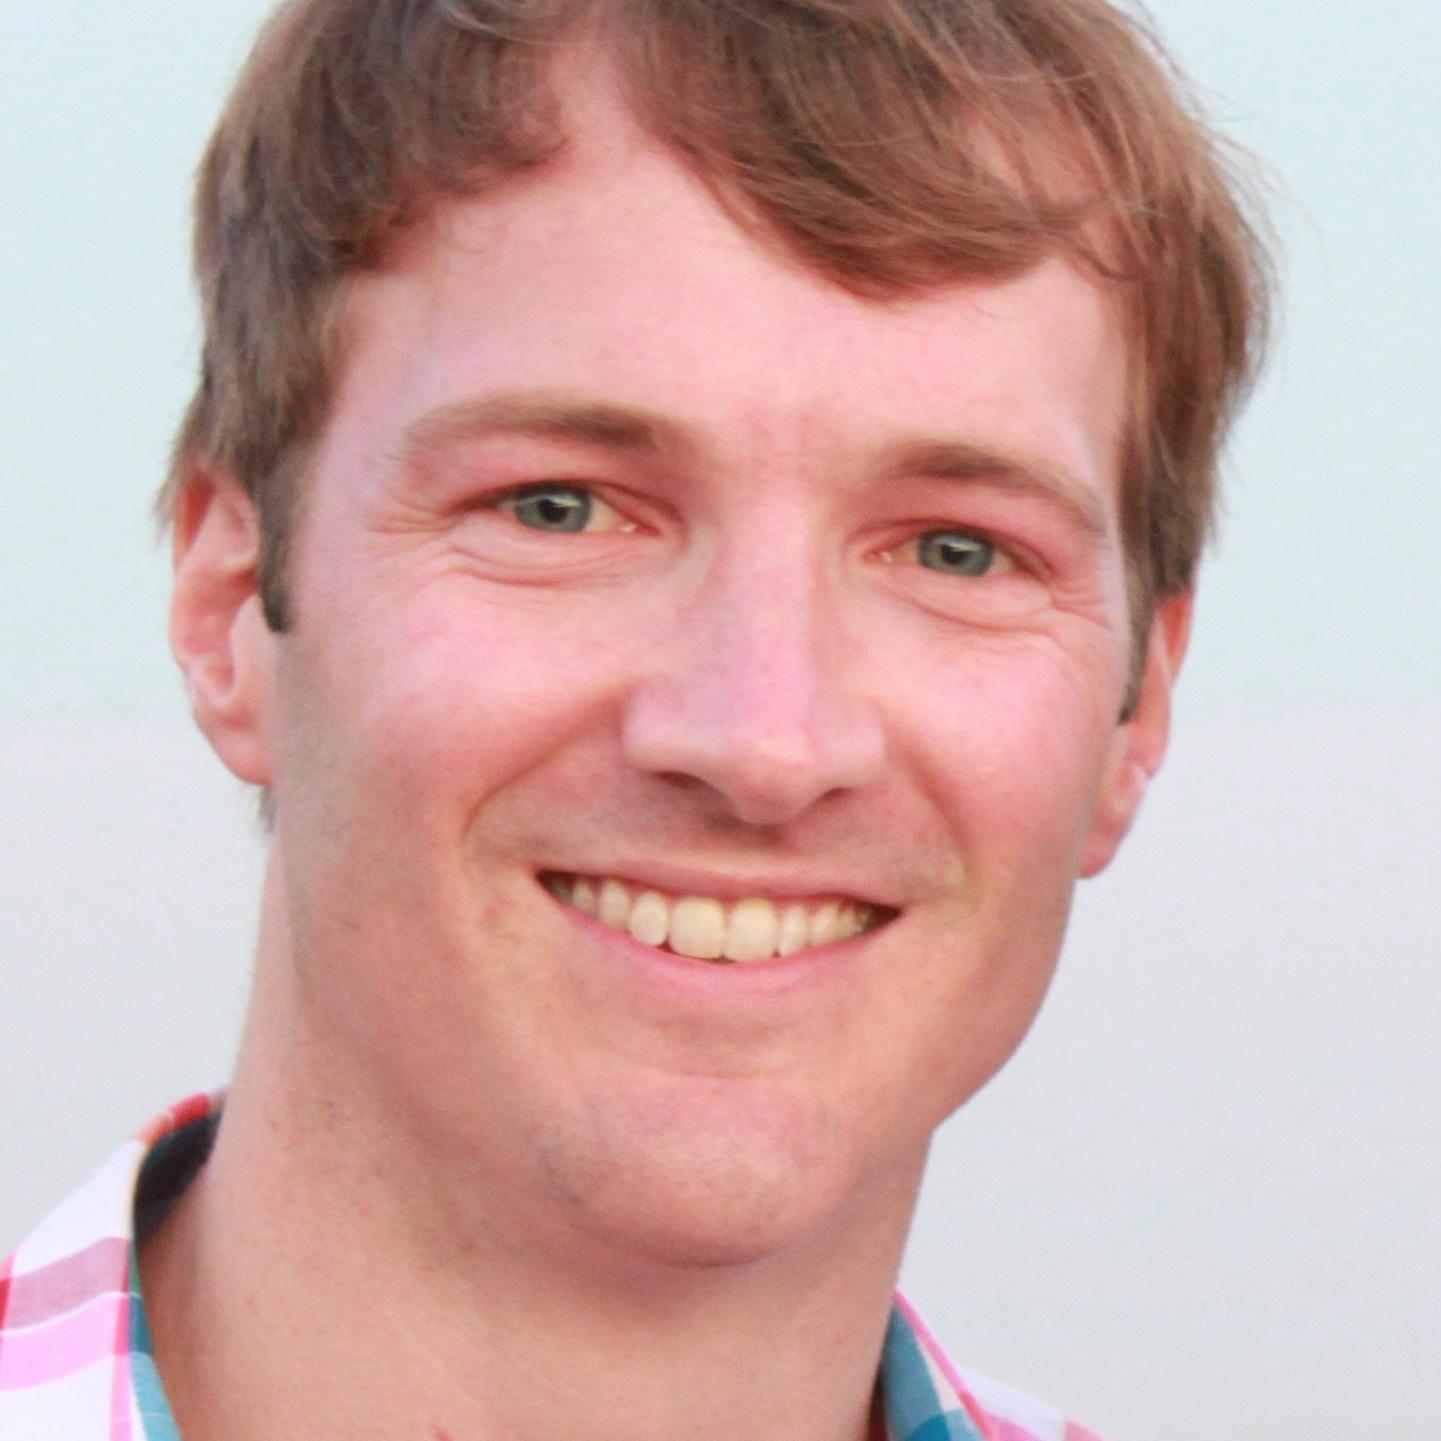 Jeff Seelbach